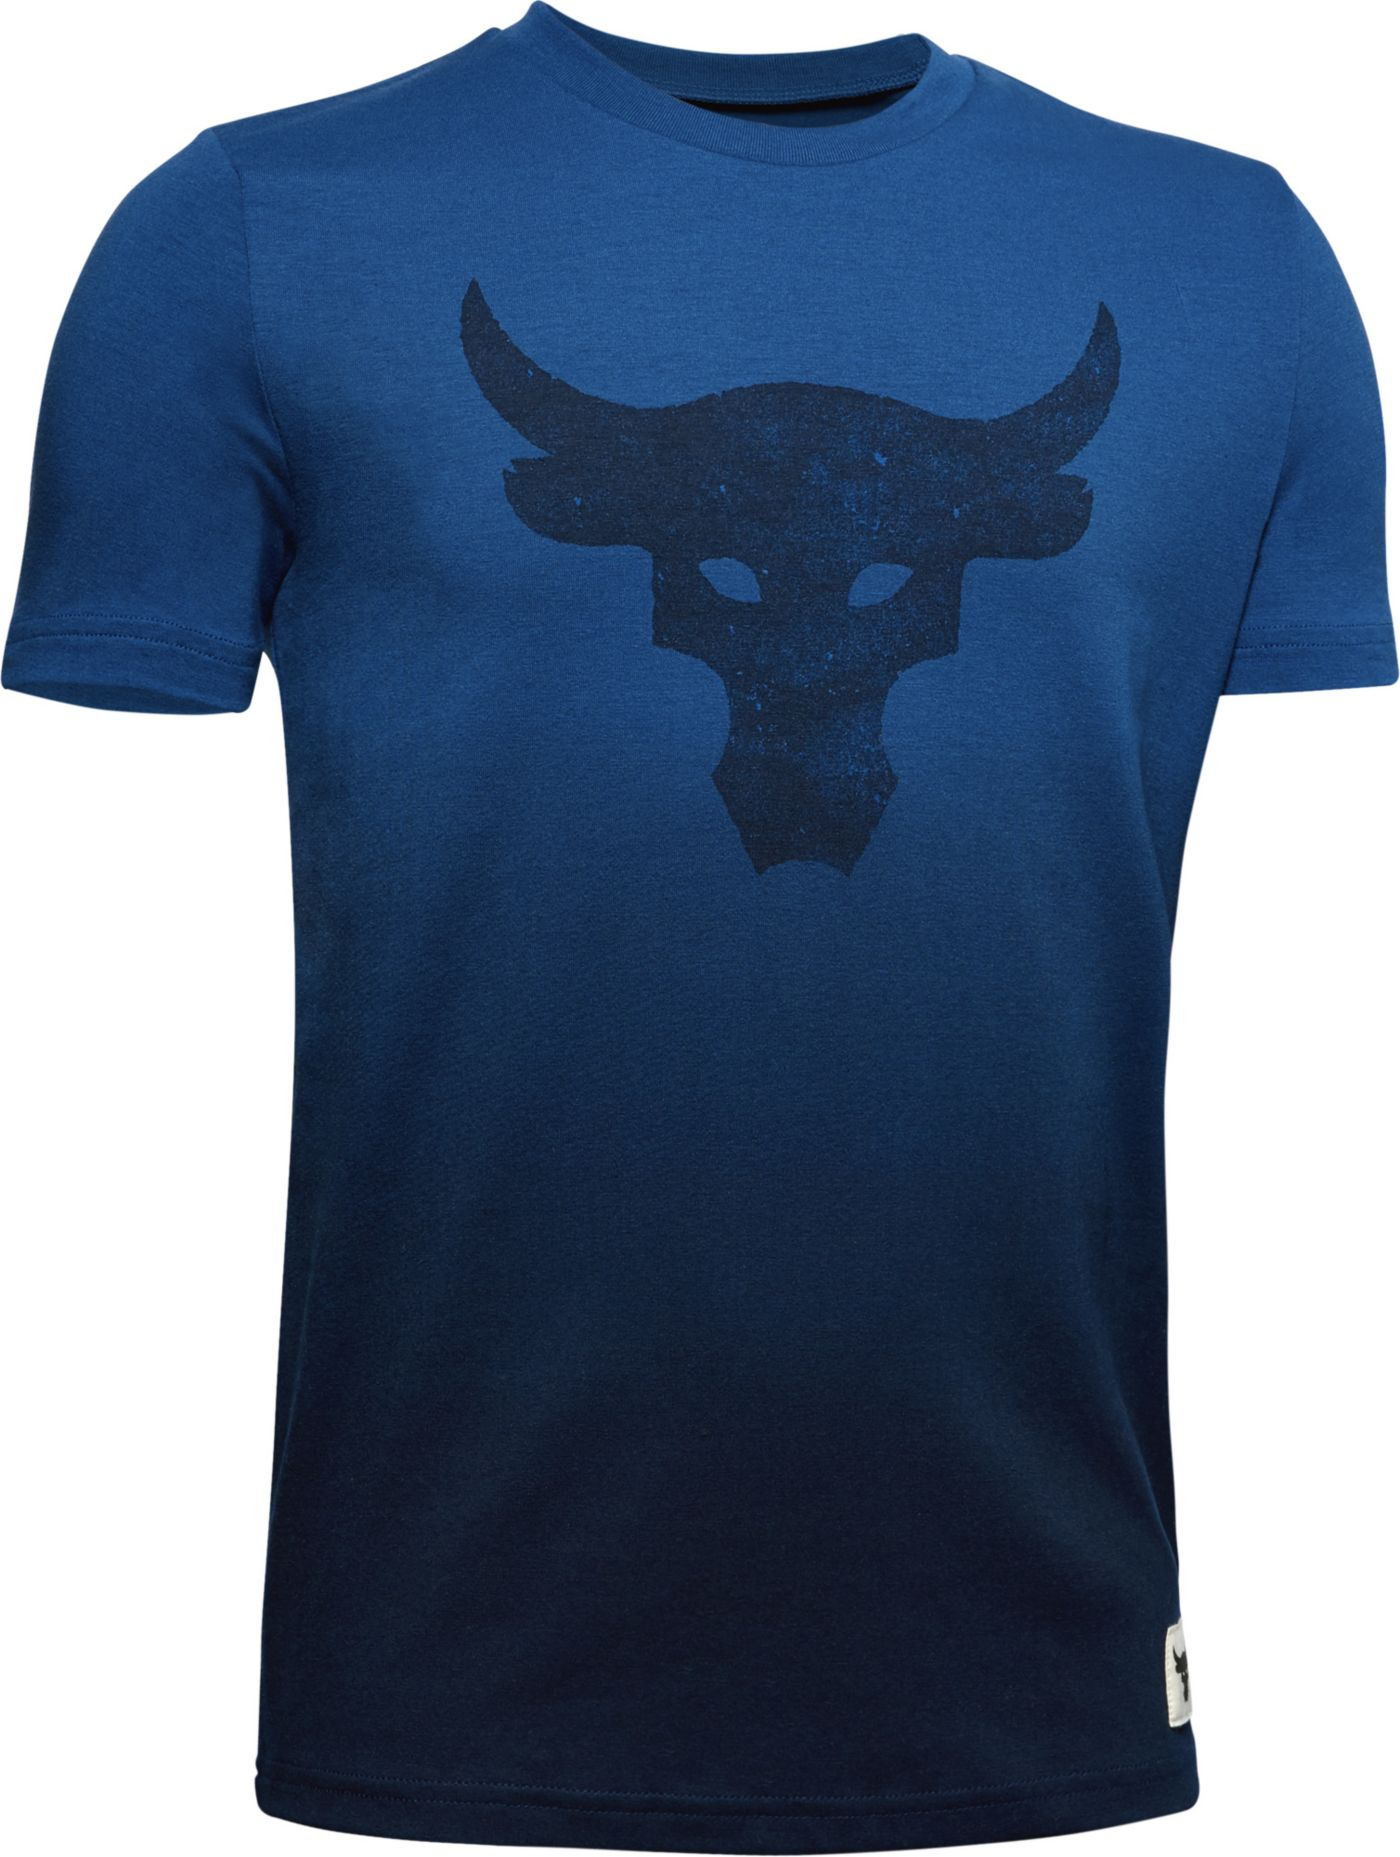 Under Armour Boys' Project Rock Brahma Bull Graphic T-Shirt